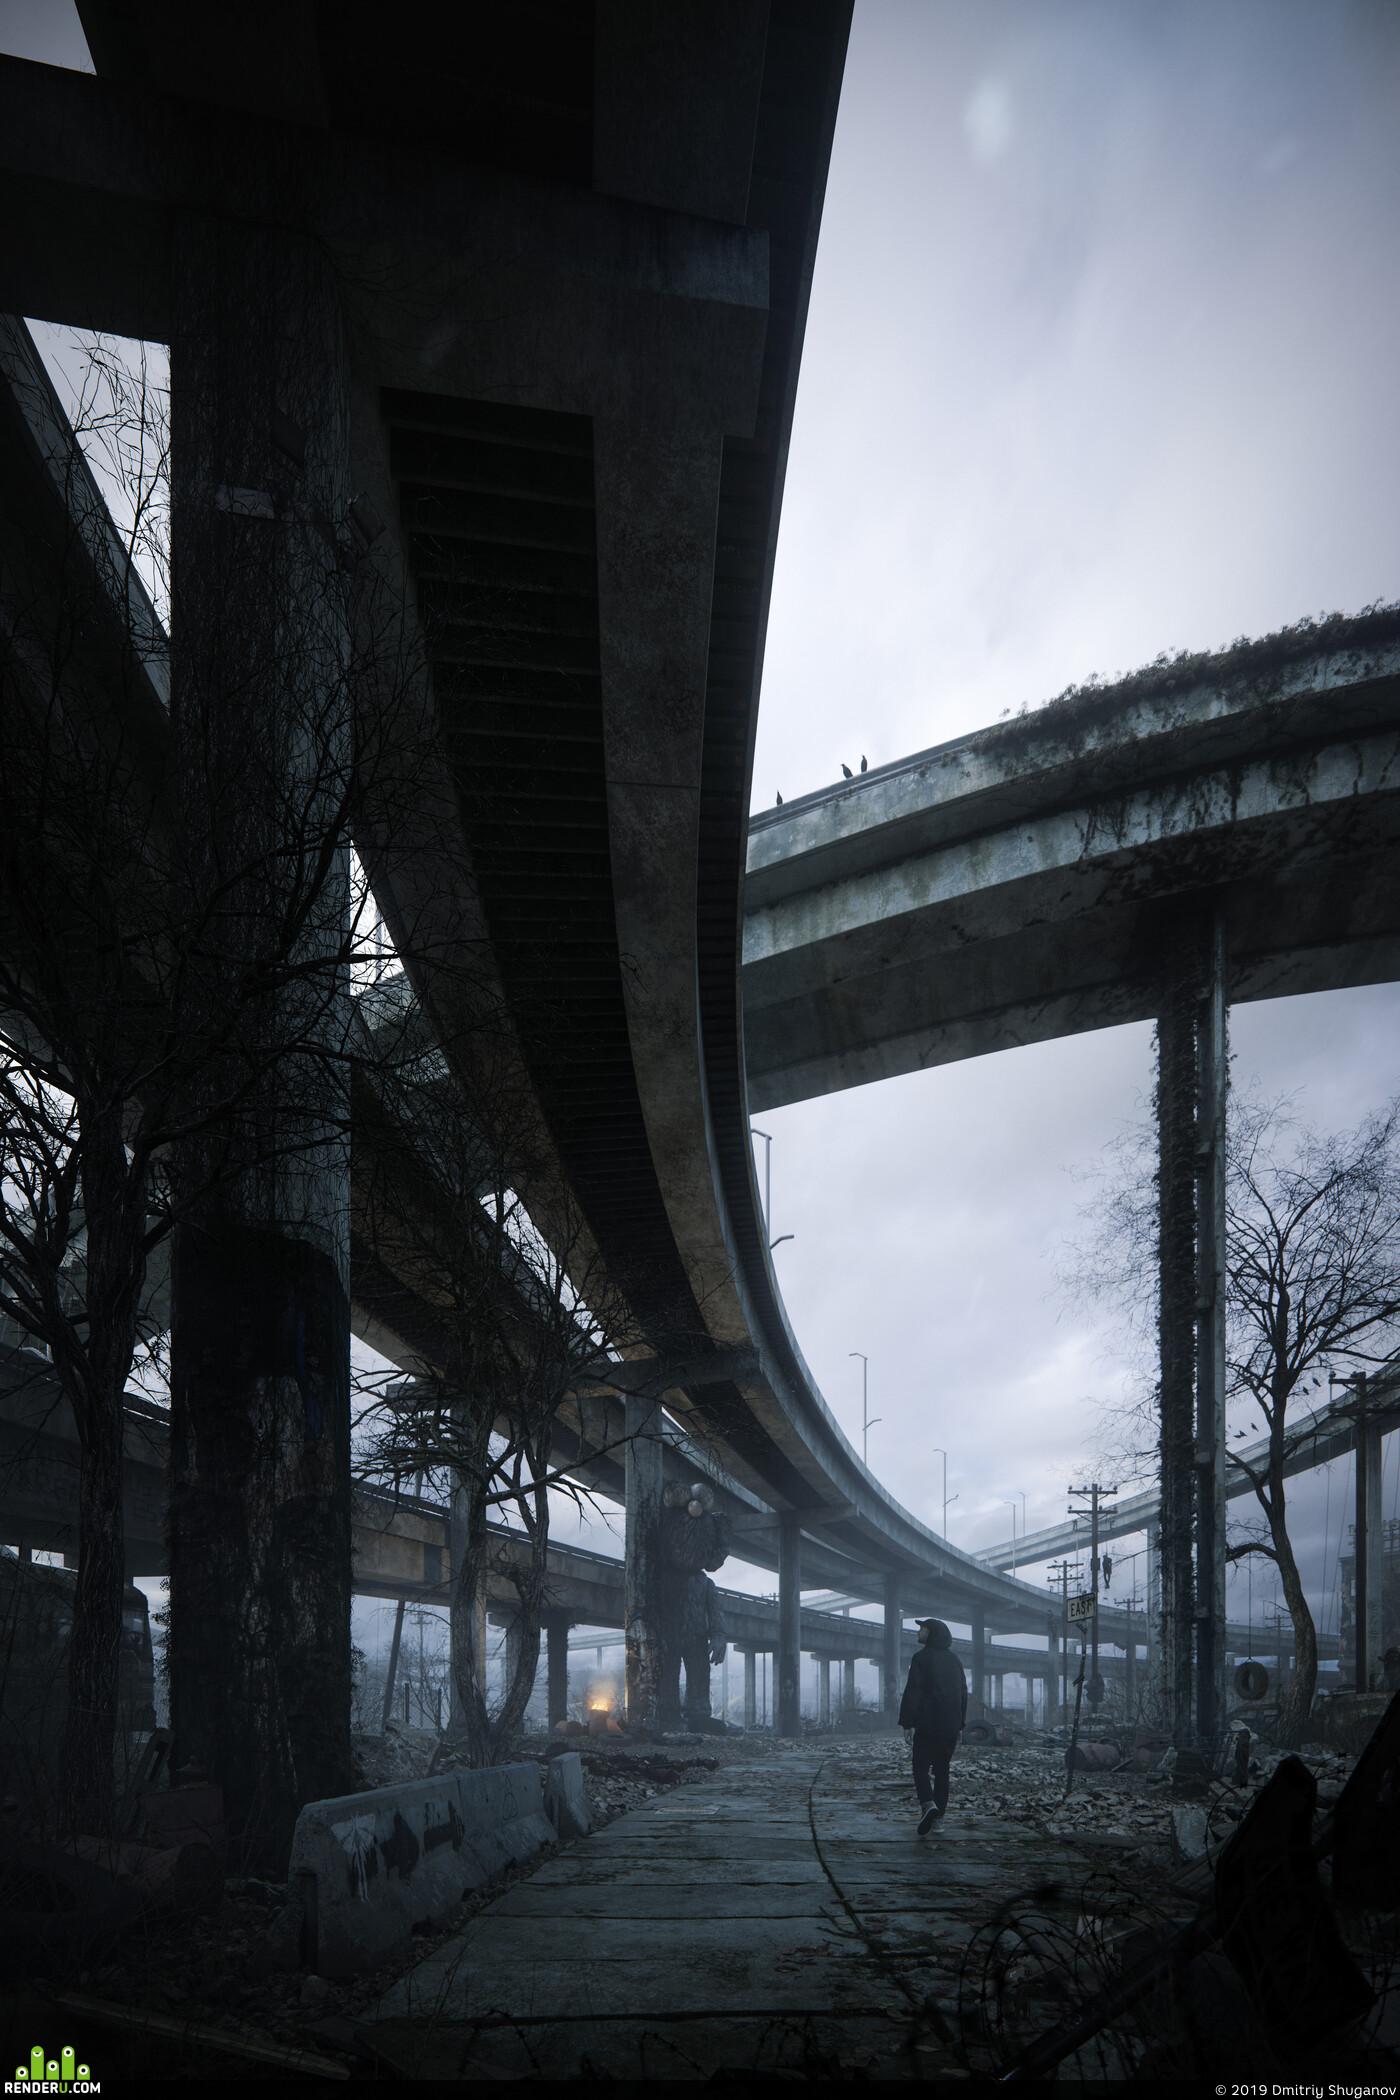 3Dsmax, digital3d, cgi, CG, 3d, coronarenderer, bridge, render, visualization, environment